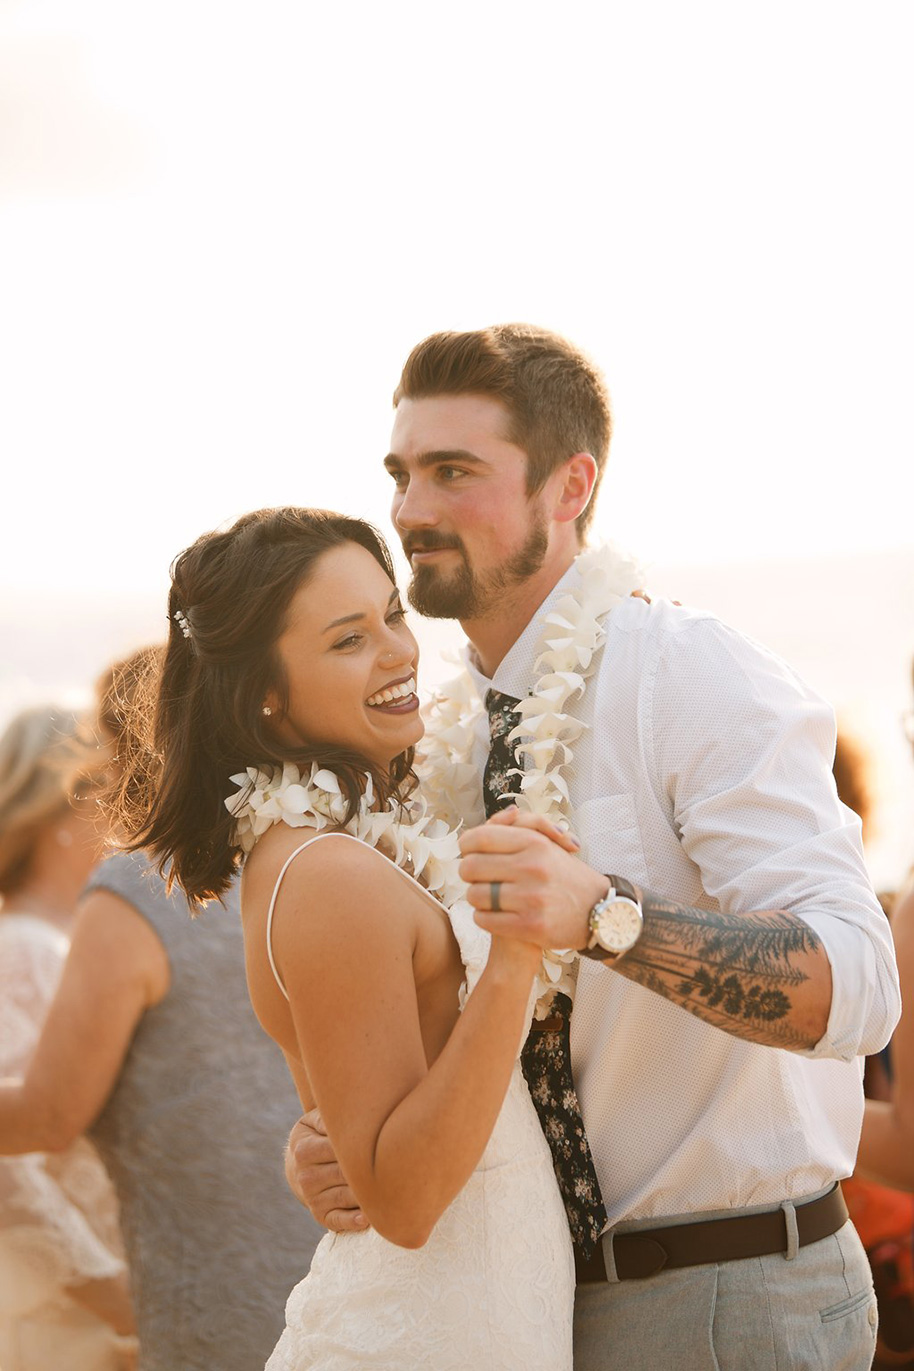 Maui-Beach-Wedding-070616-16